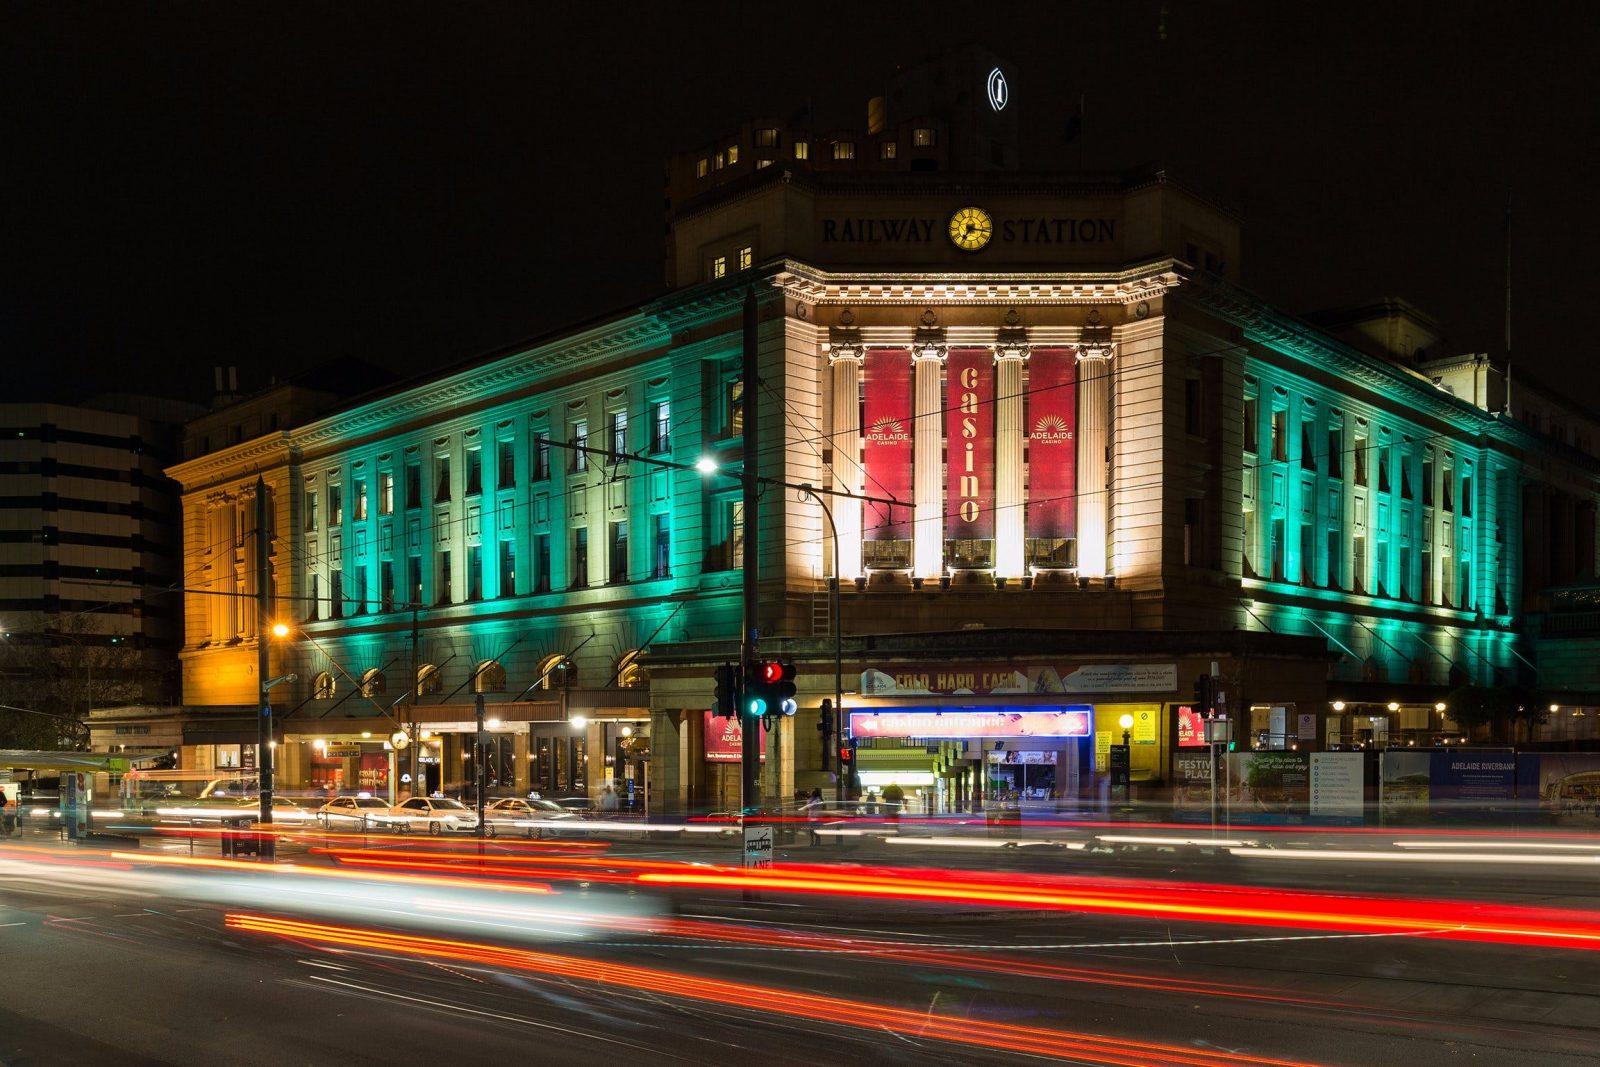 Adelaide Casino - At Night